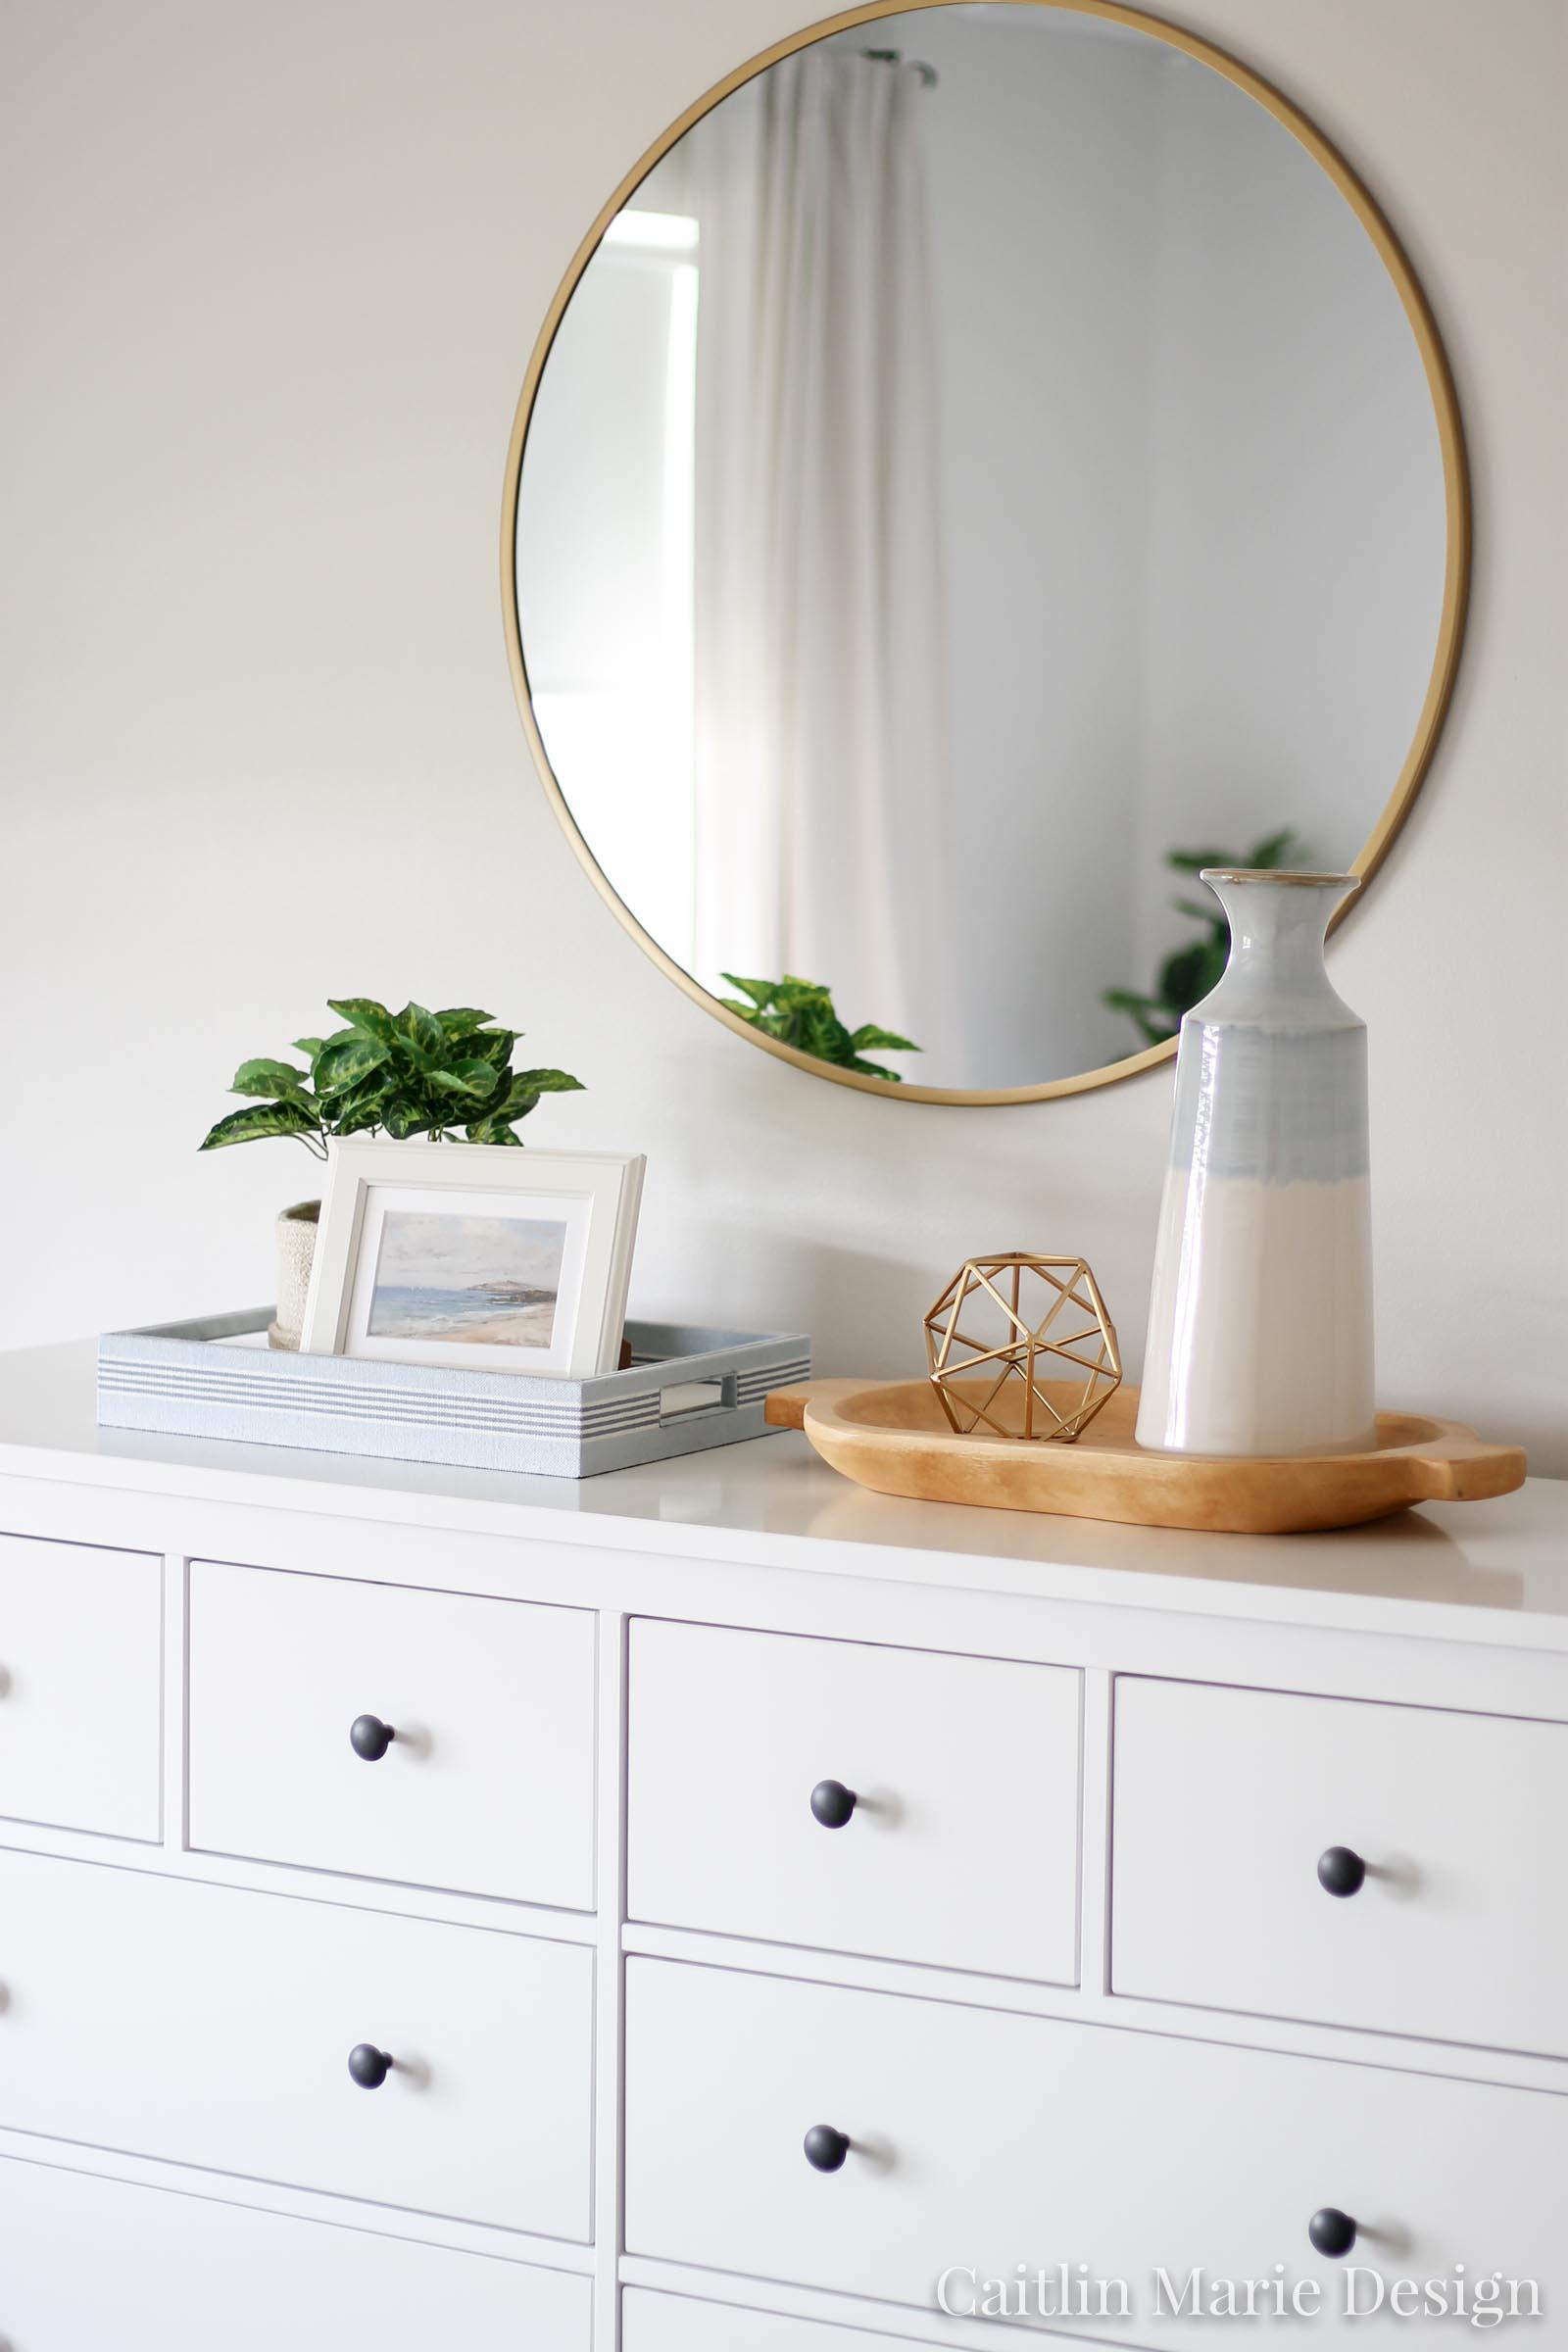 Casual Coastal Master Bedroom Update | IKEA Hemnes 8 drawer dresser, modern traditional decor, minimalist style, boho home